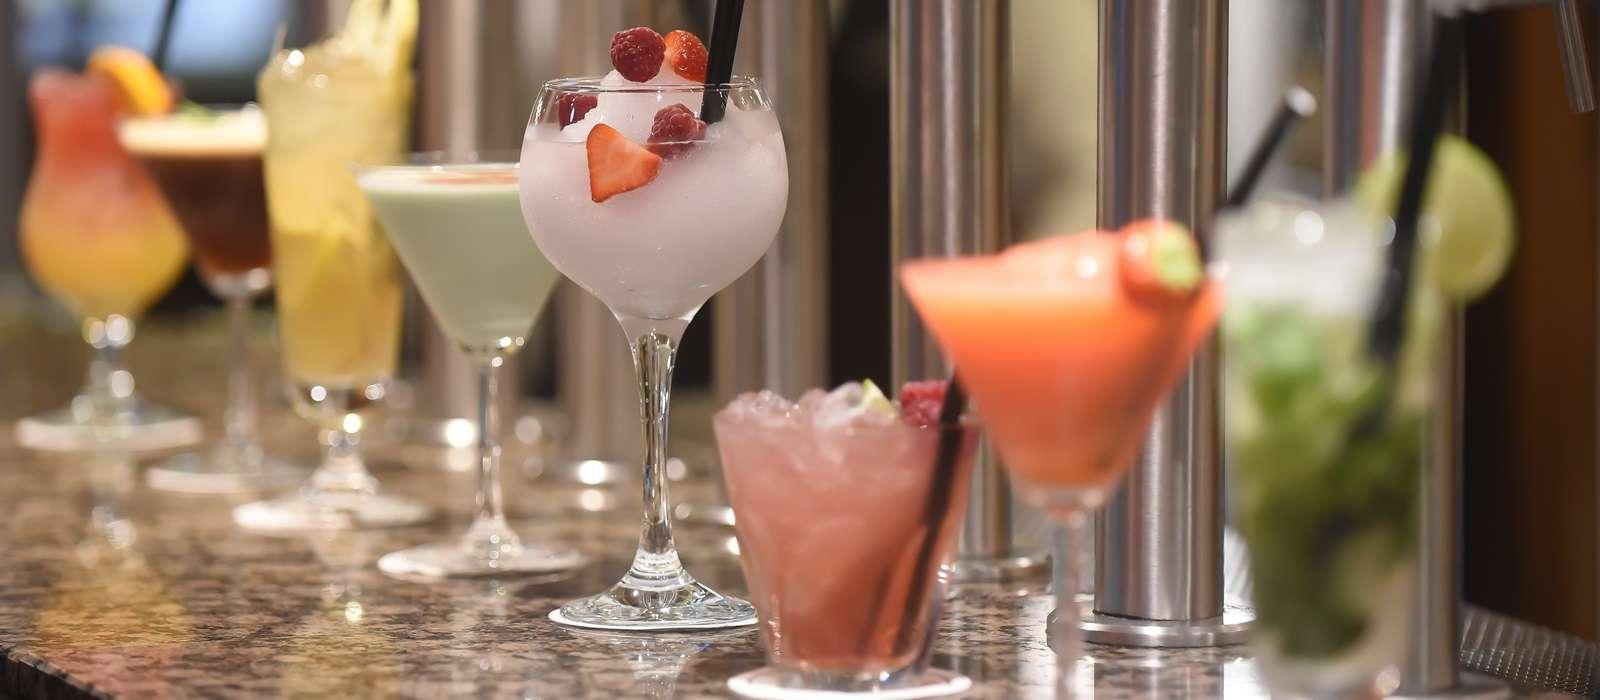 Cocktails Coleraine, Coleraine Cocktail Bar, Pub Cocktails Coleraine